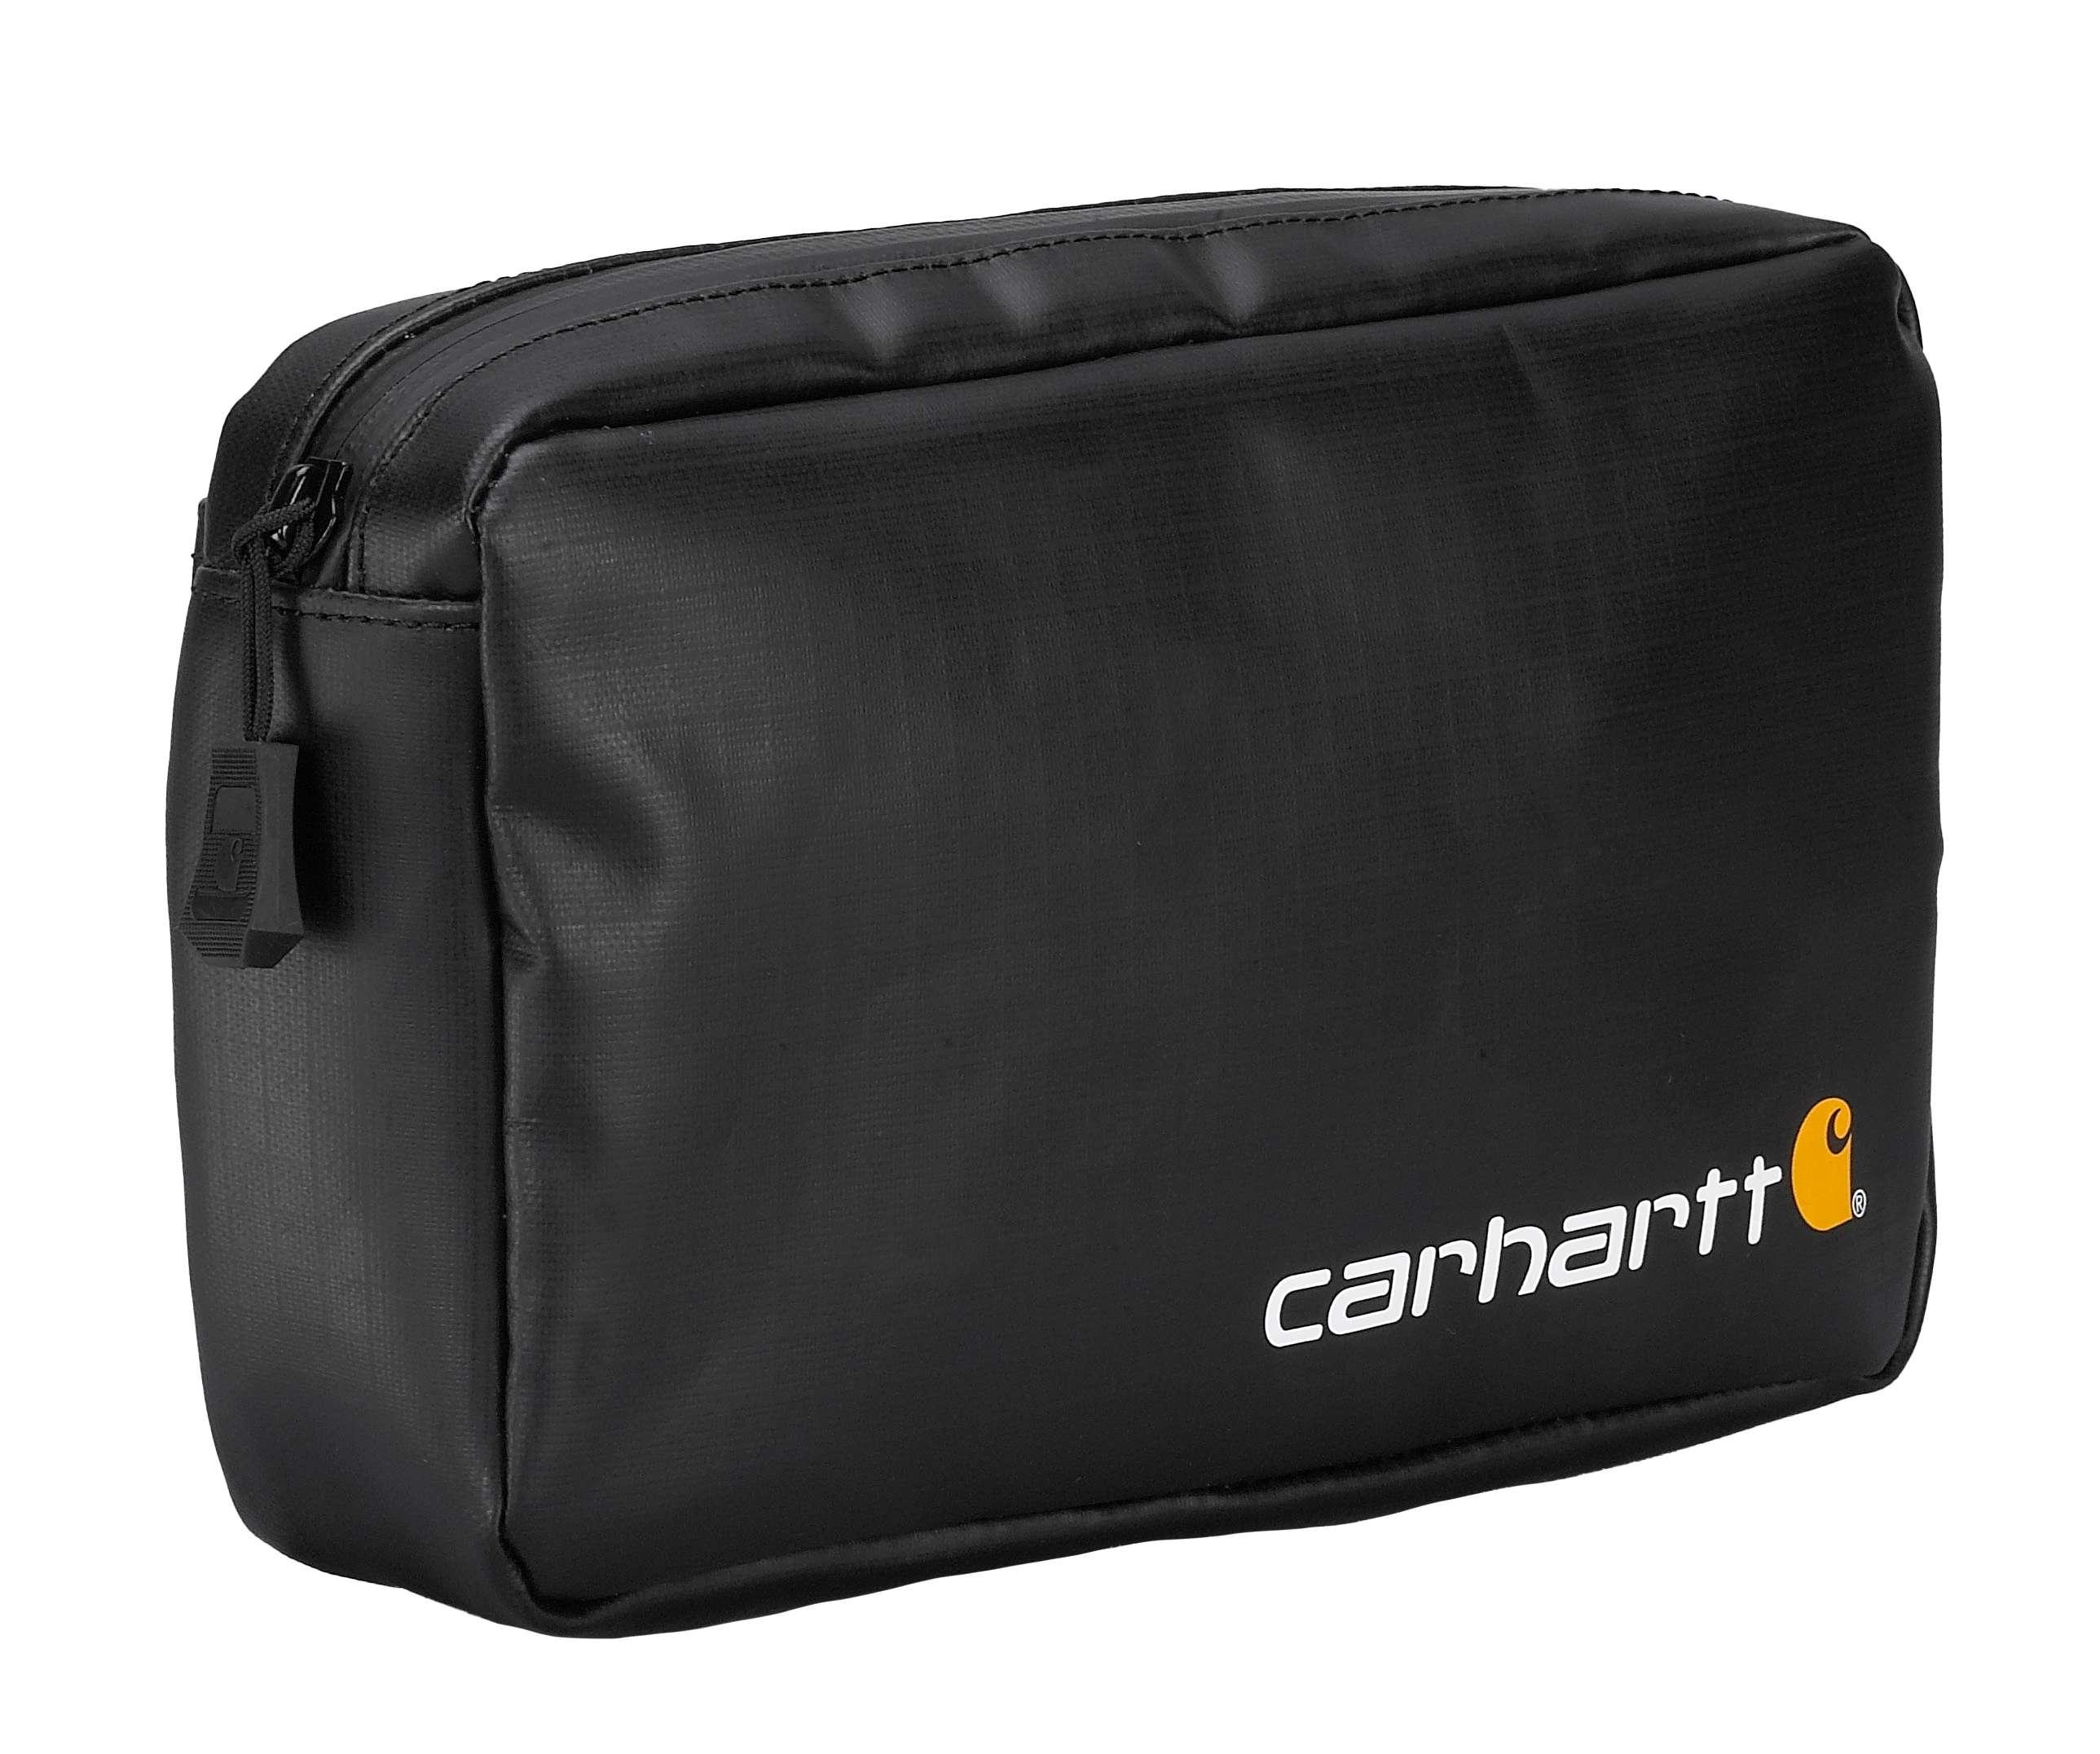 Carhartt Weatherproof Utility Case